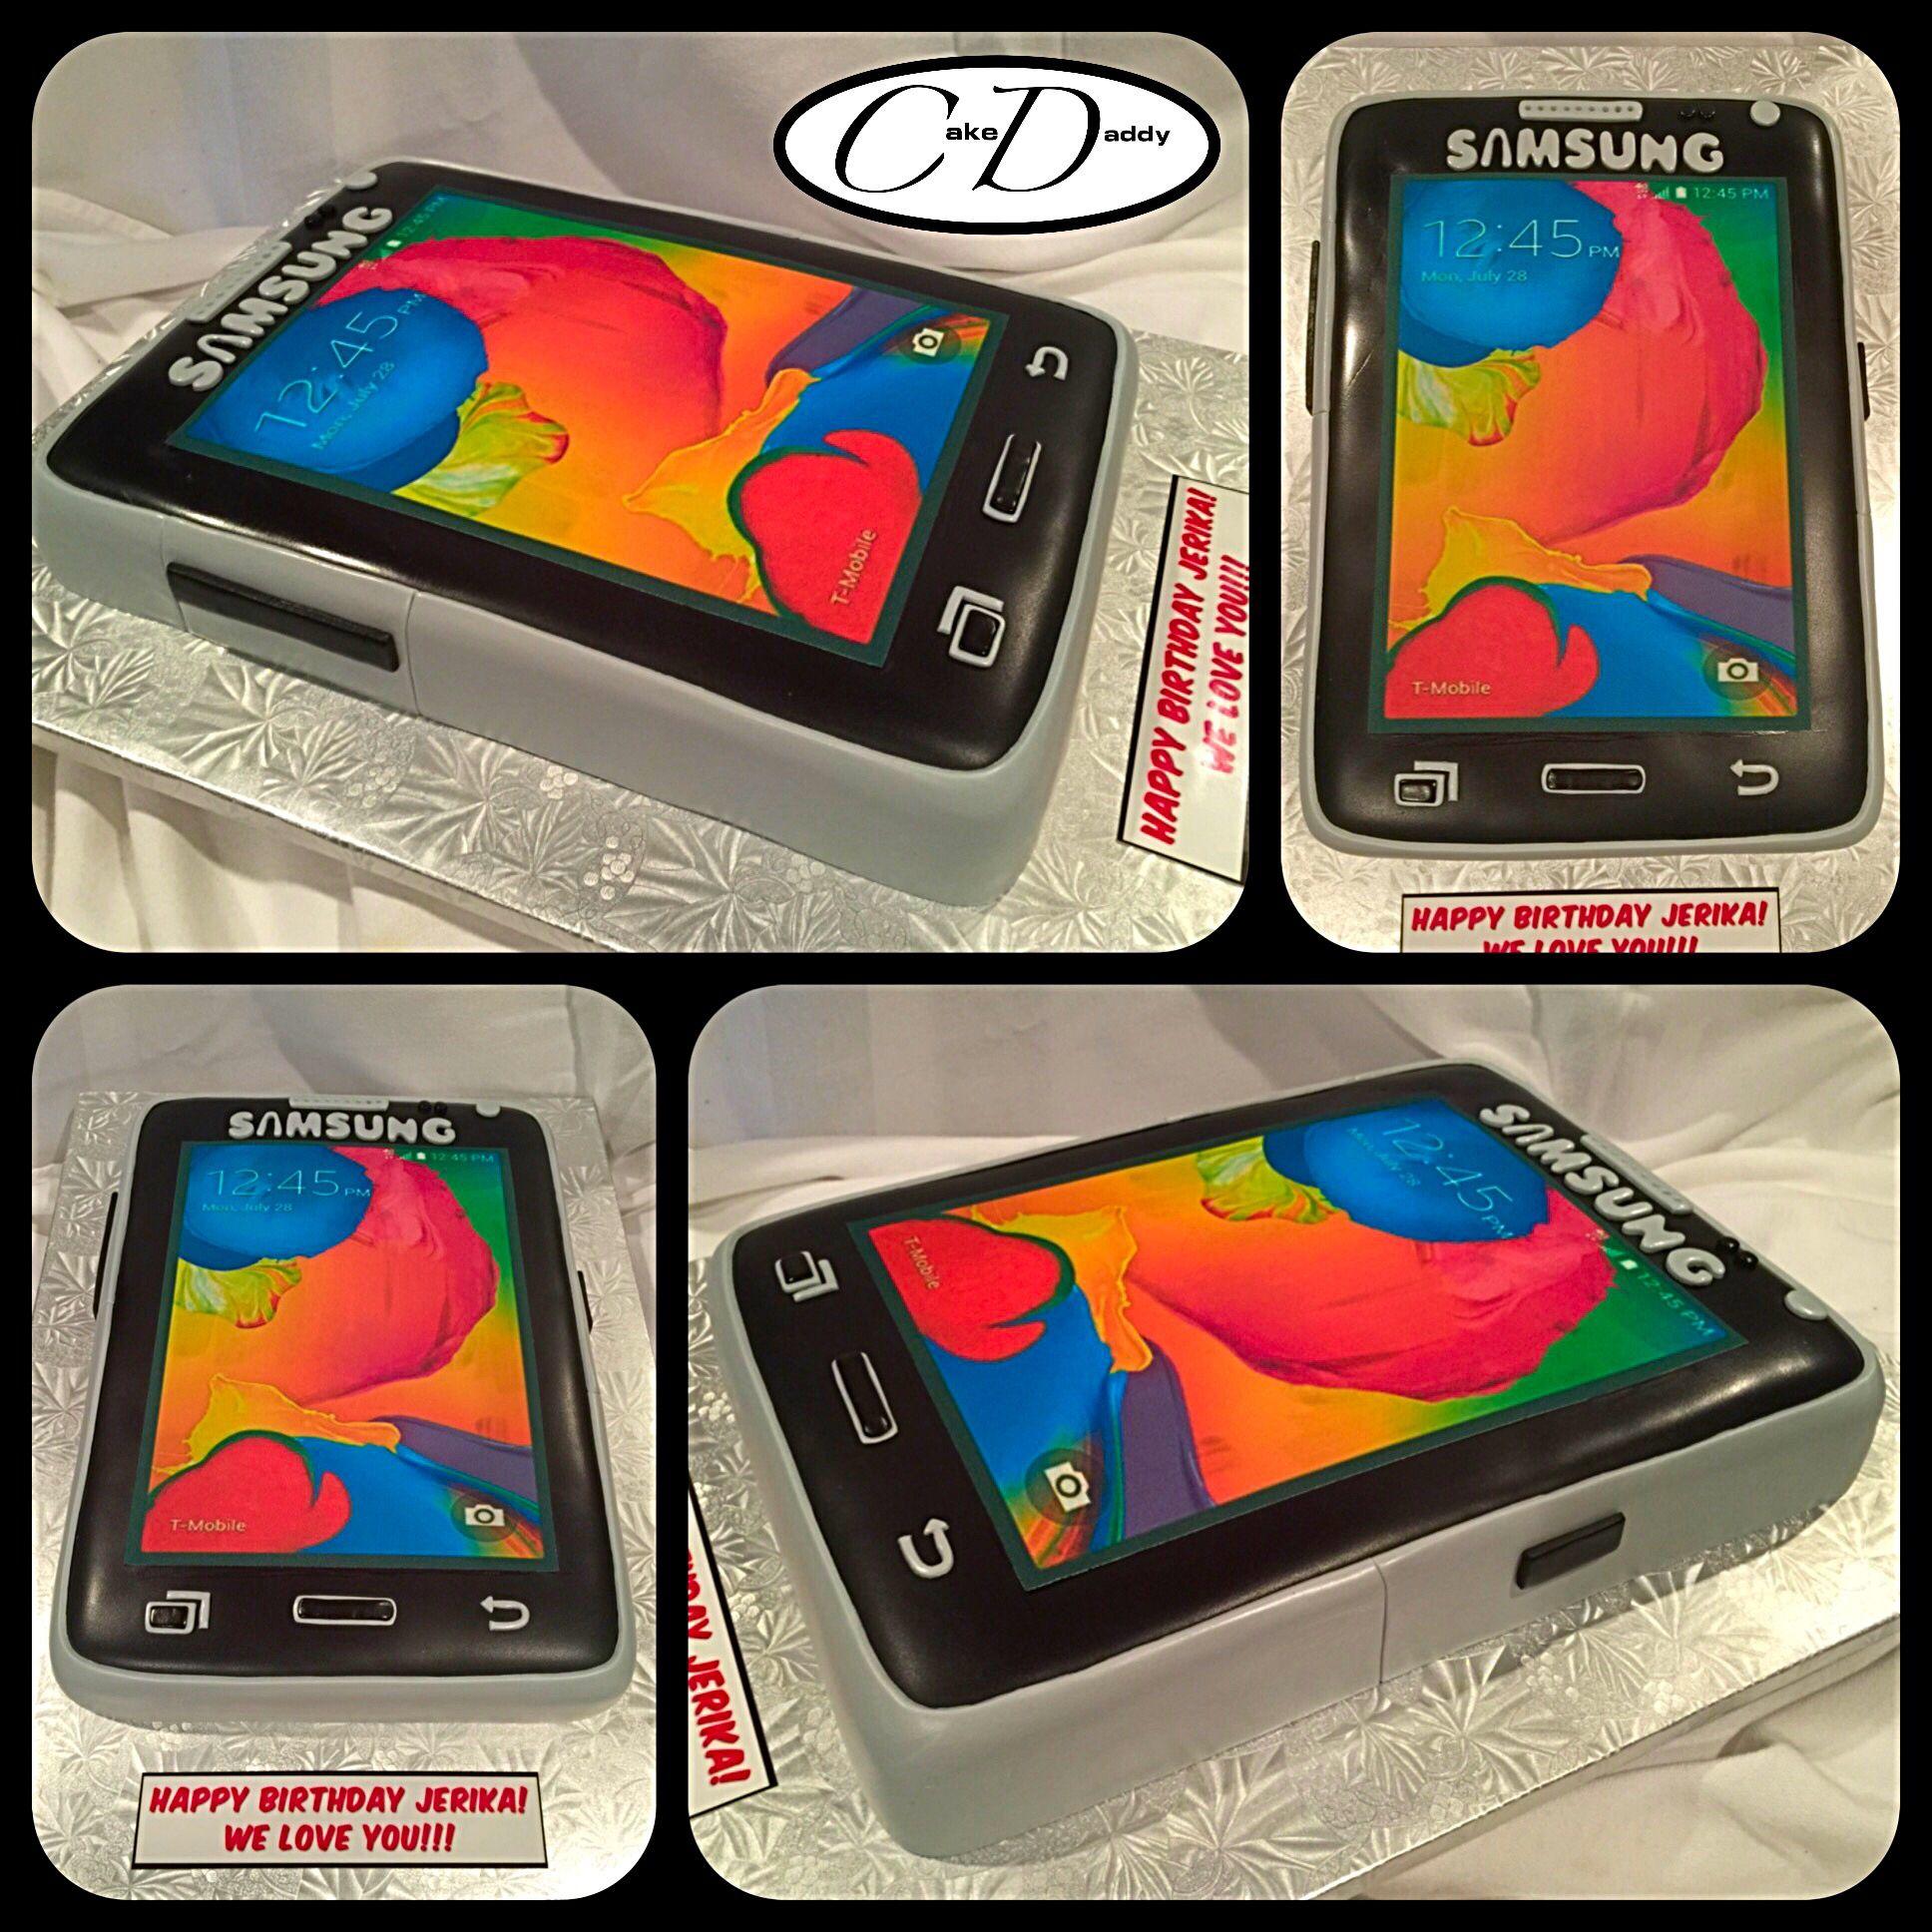 Samsung Avant cell phone birthday cake Custom Cakes by Cake Daddy